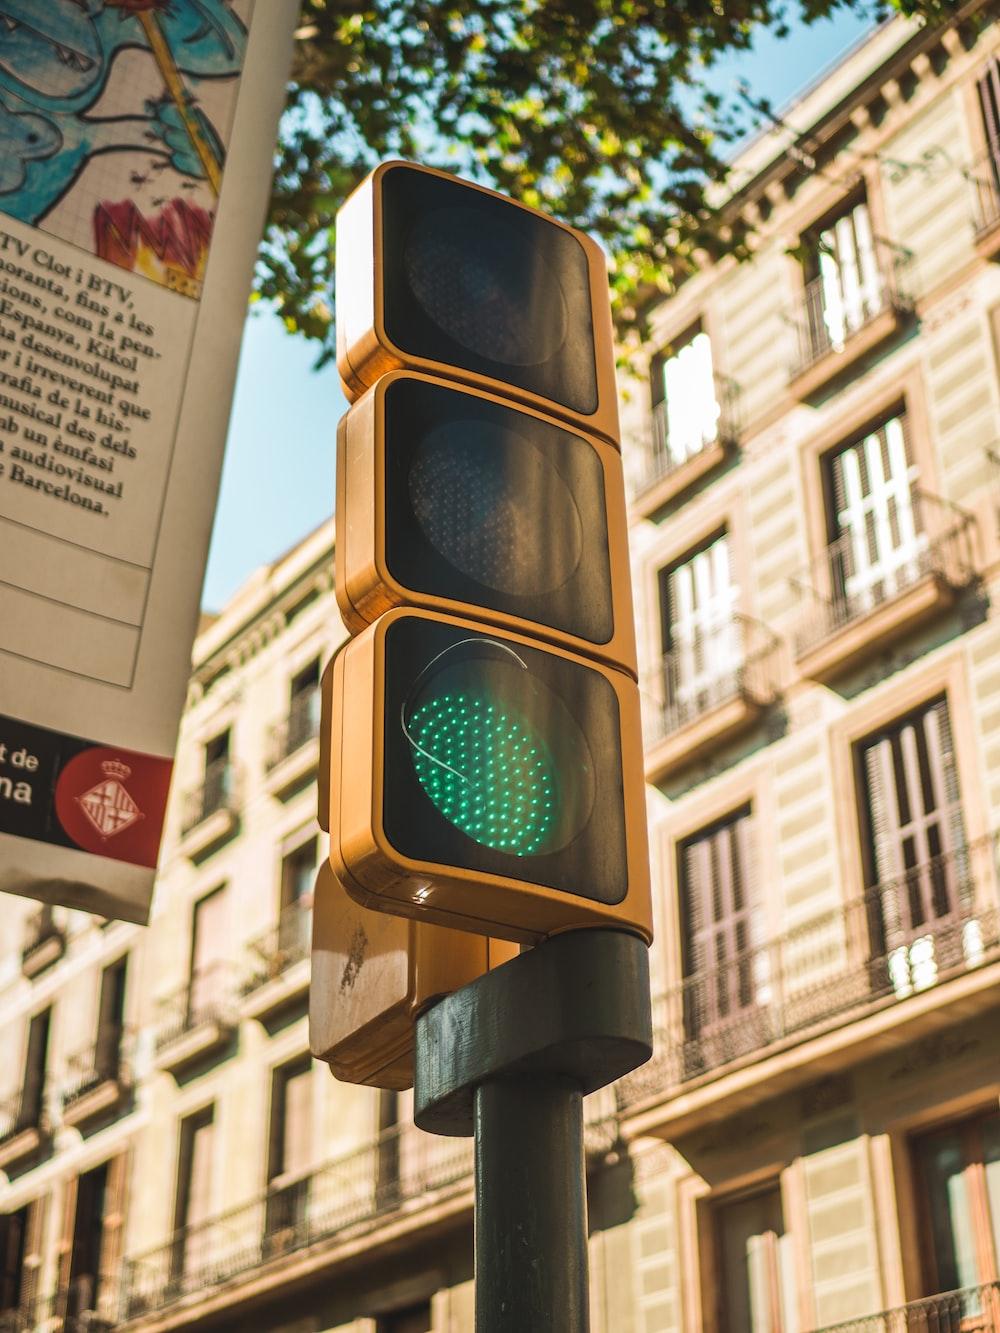 traffic light displaying green light